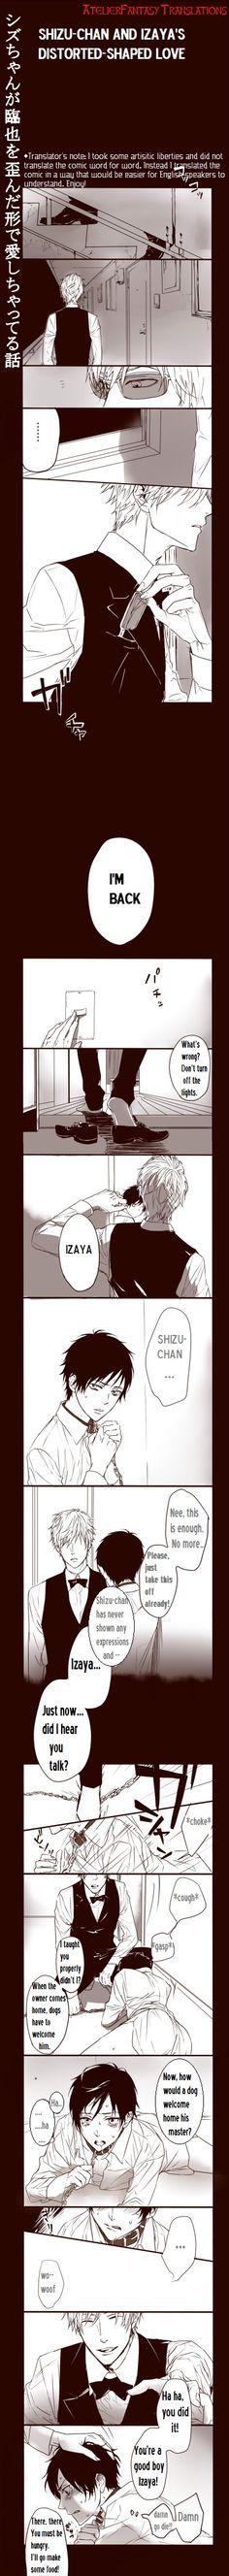 Oh a sadism Shizu-chan